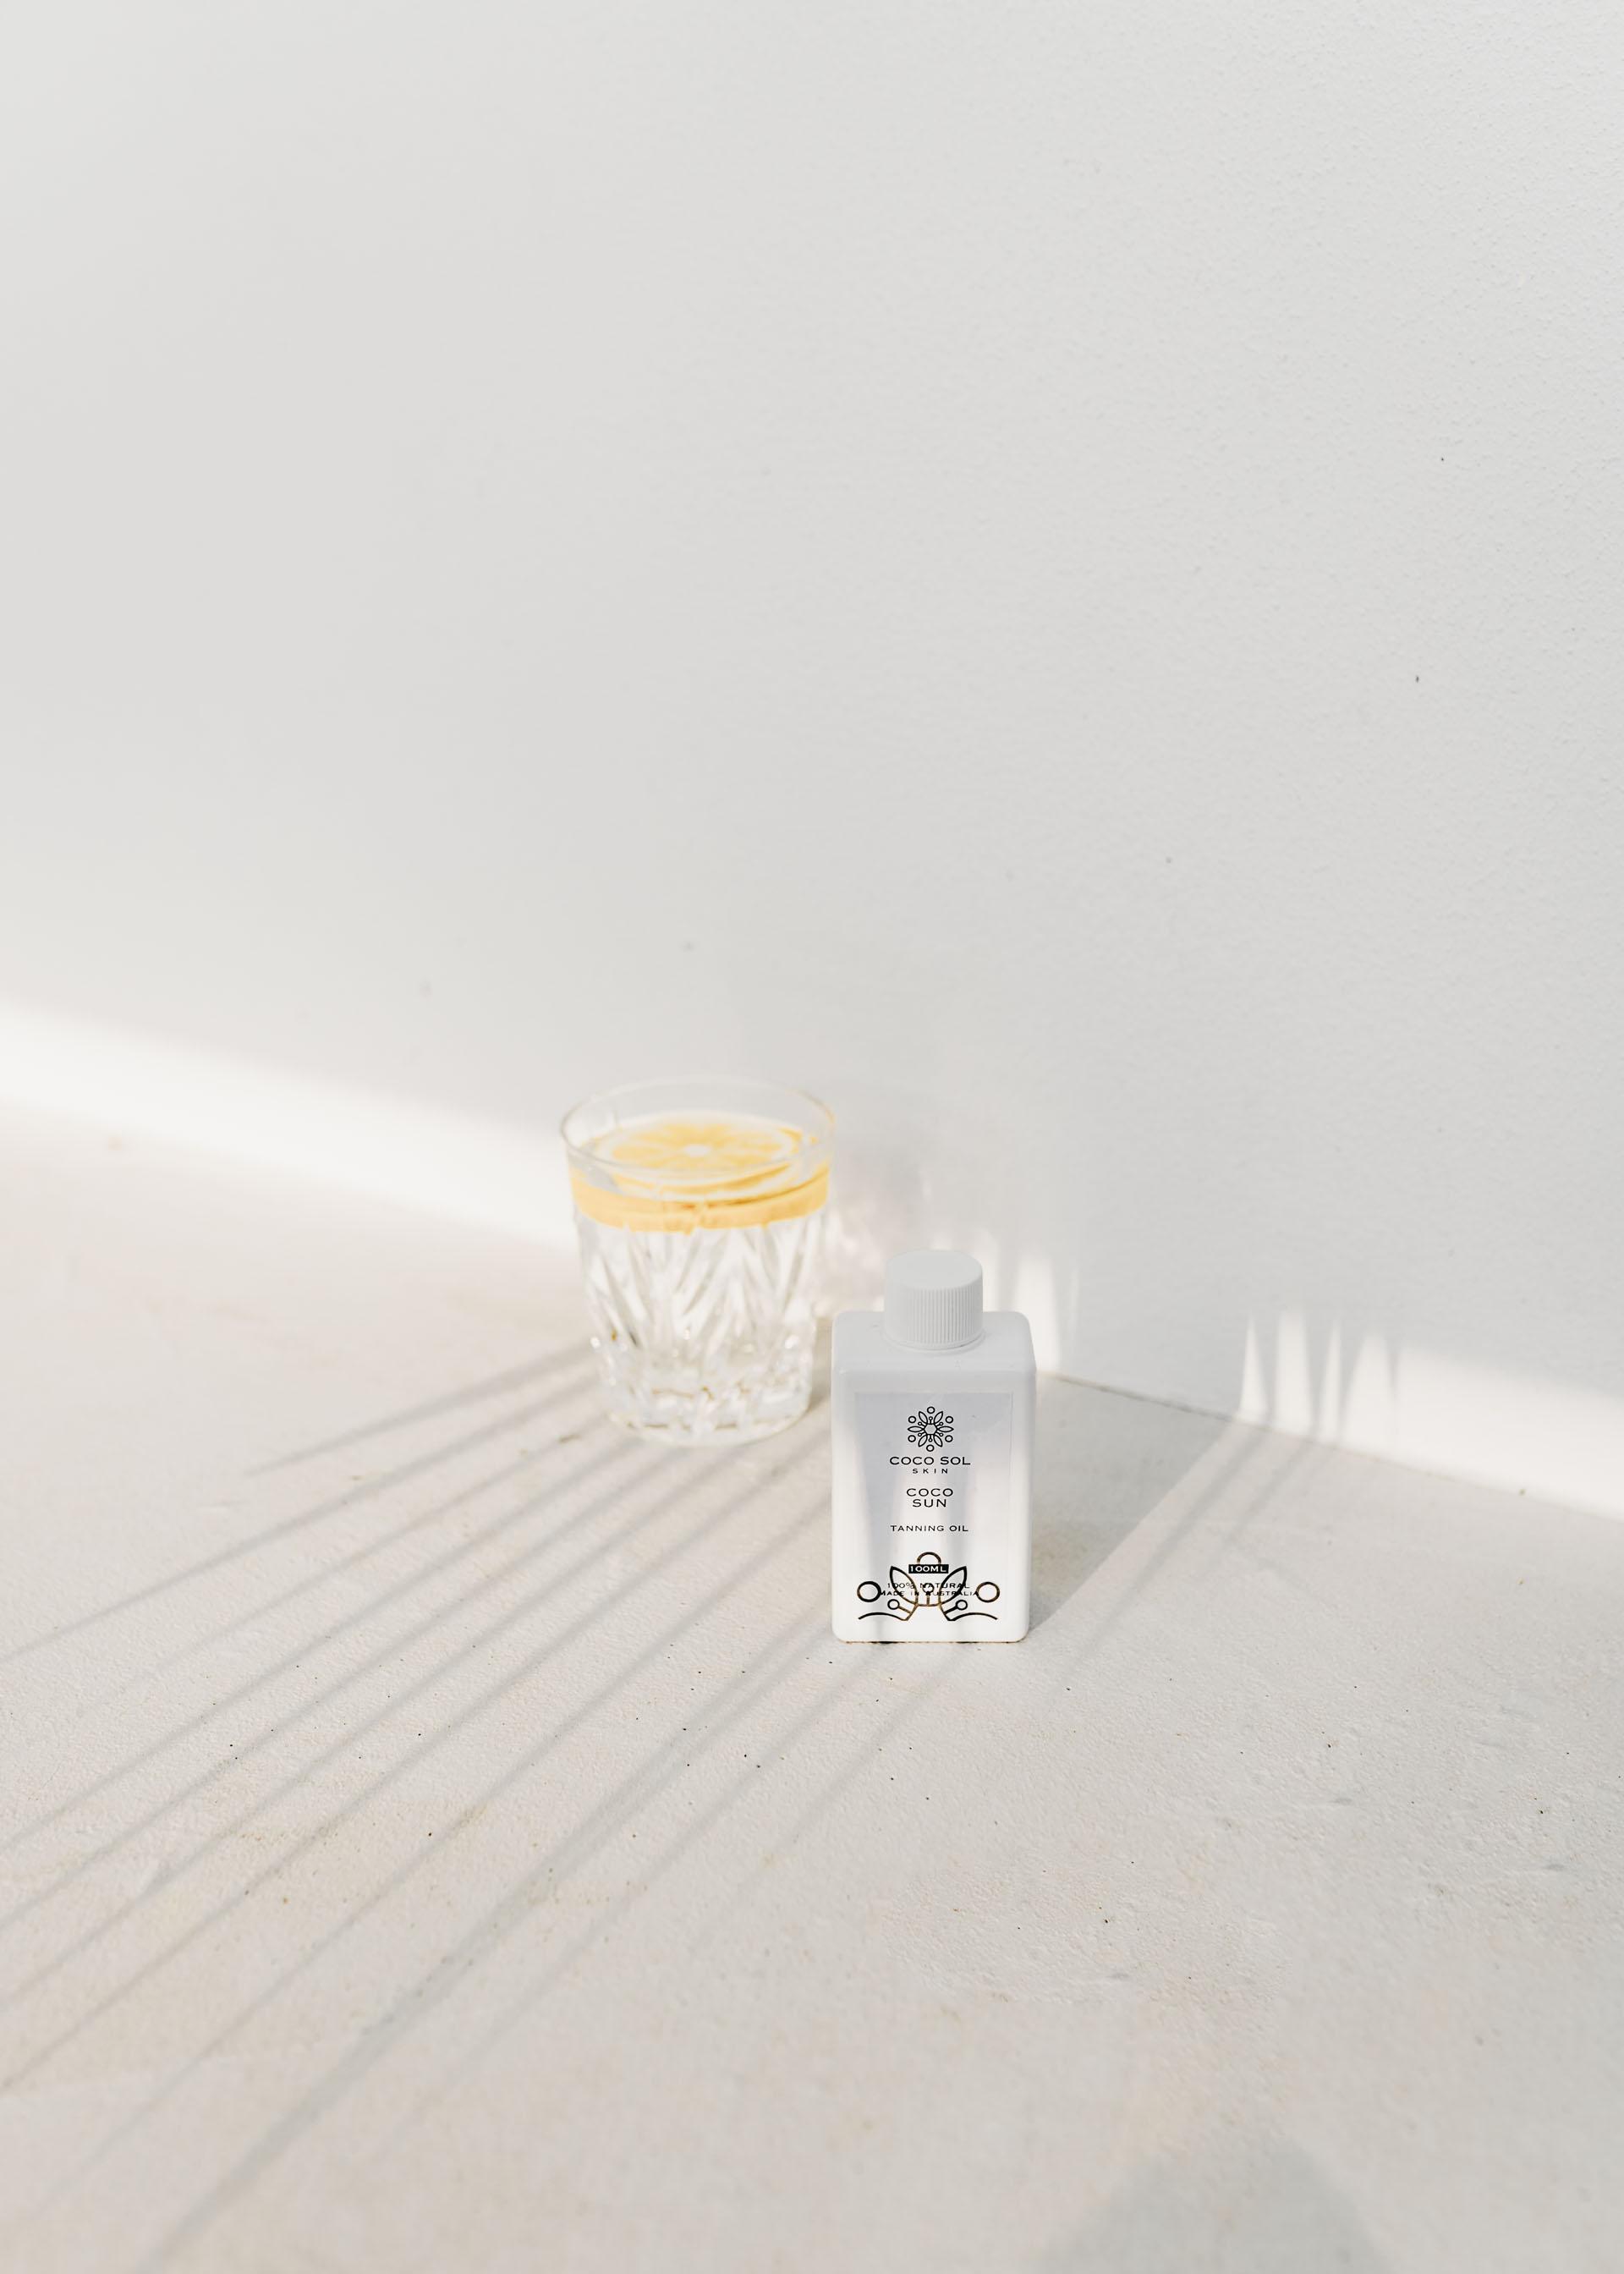 keira-mason-coco-sol-bottle-and-shadows.jpg